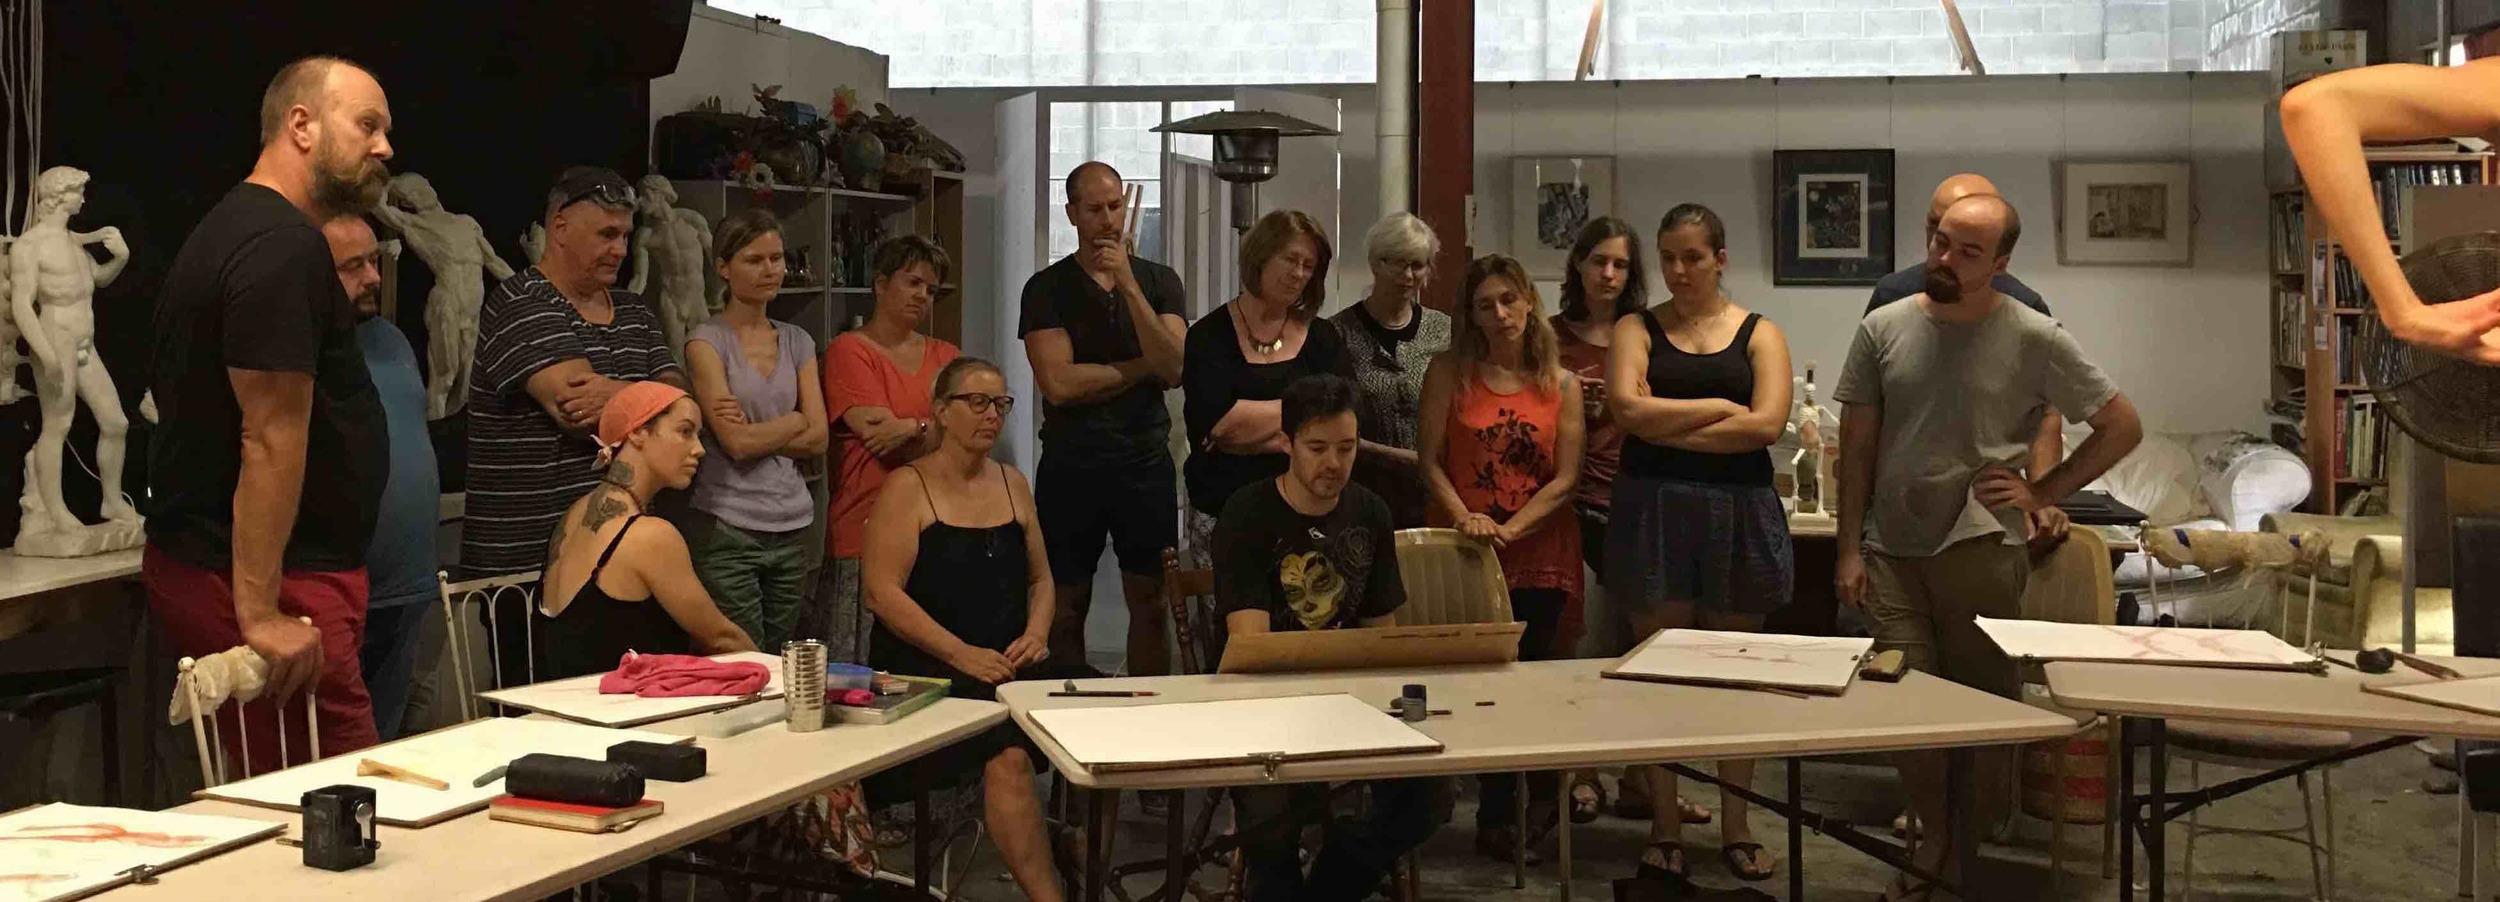 Scott Breton Form Gesture Anatomy Drawing course 2016 01workshop bris 2016 lesson 1 - 16.jpeg